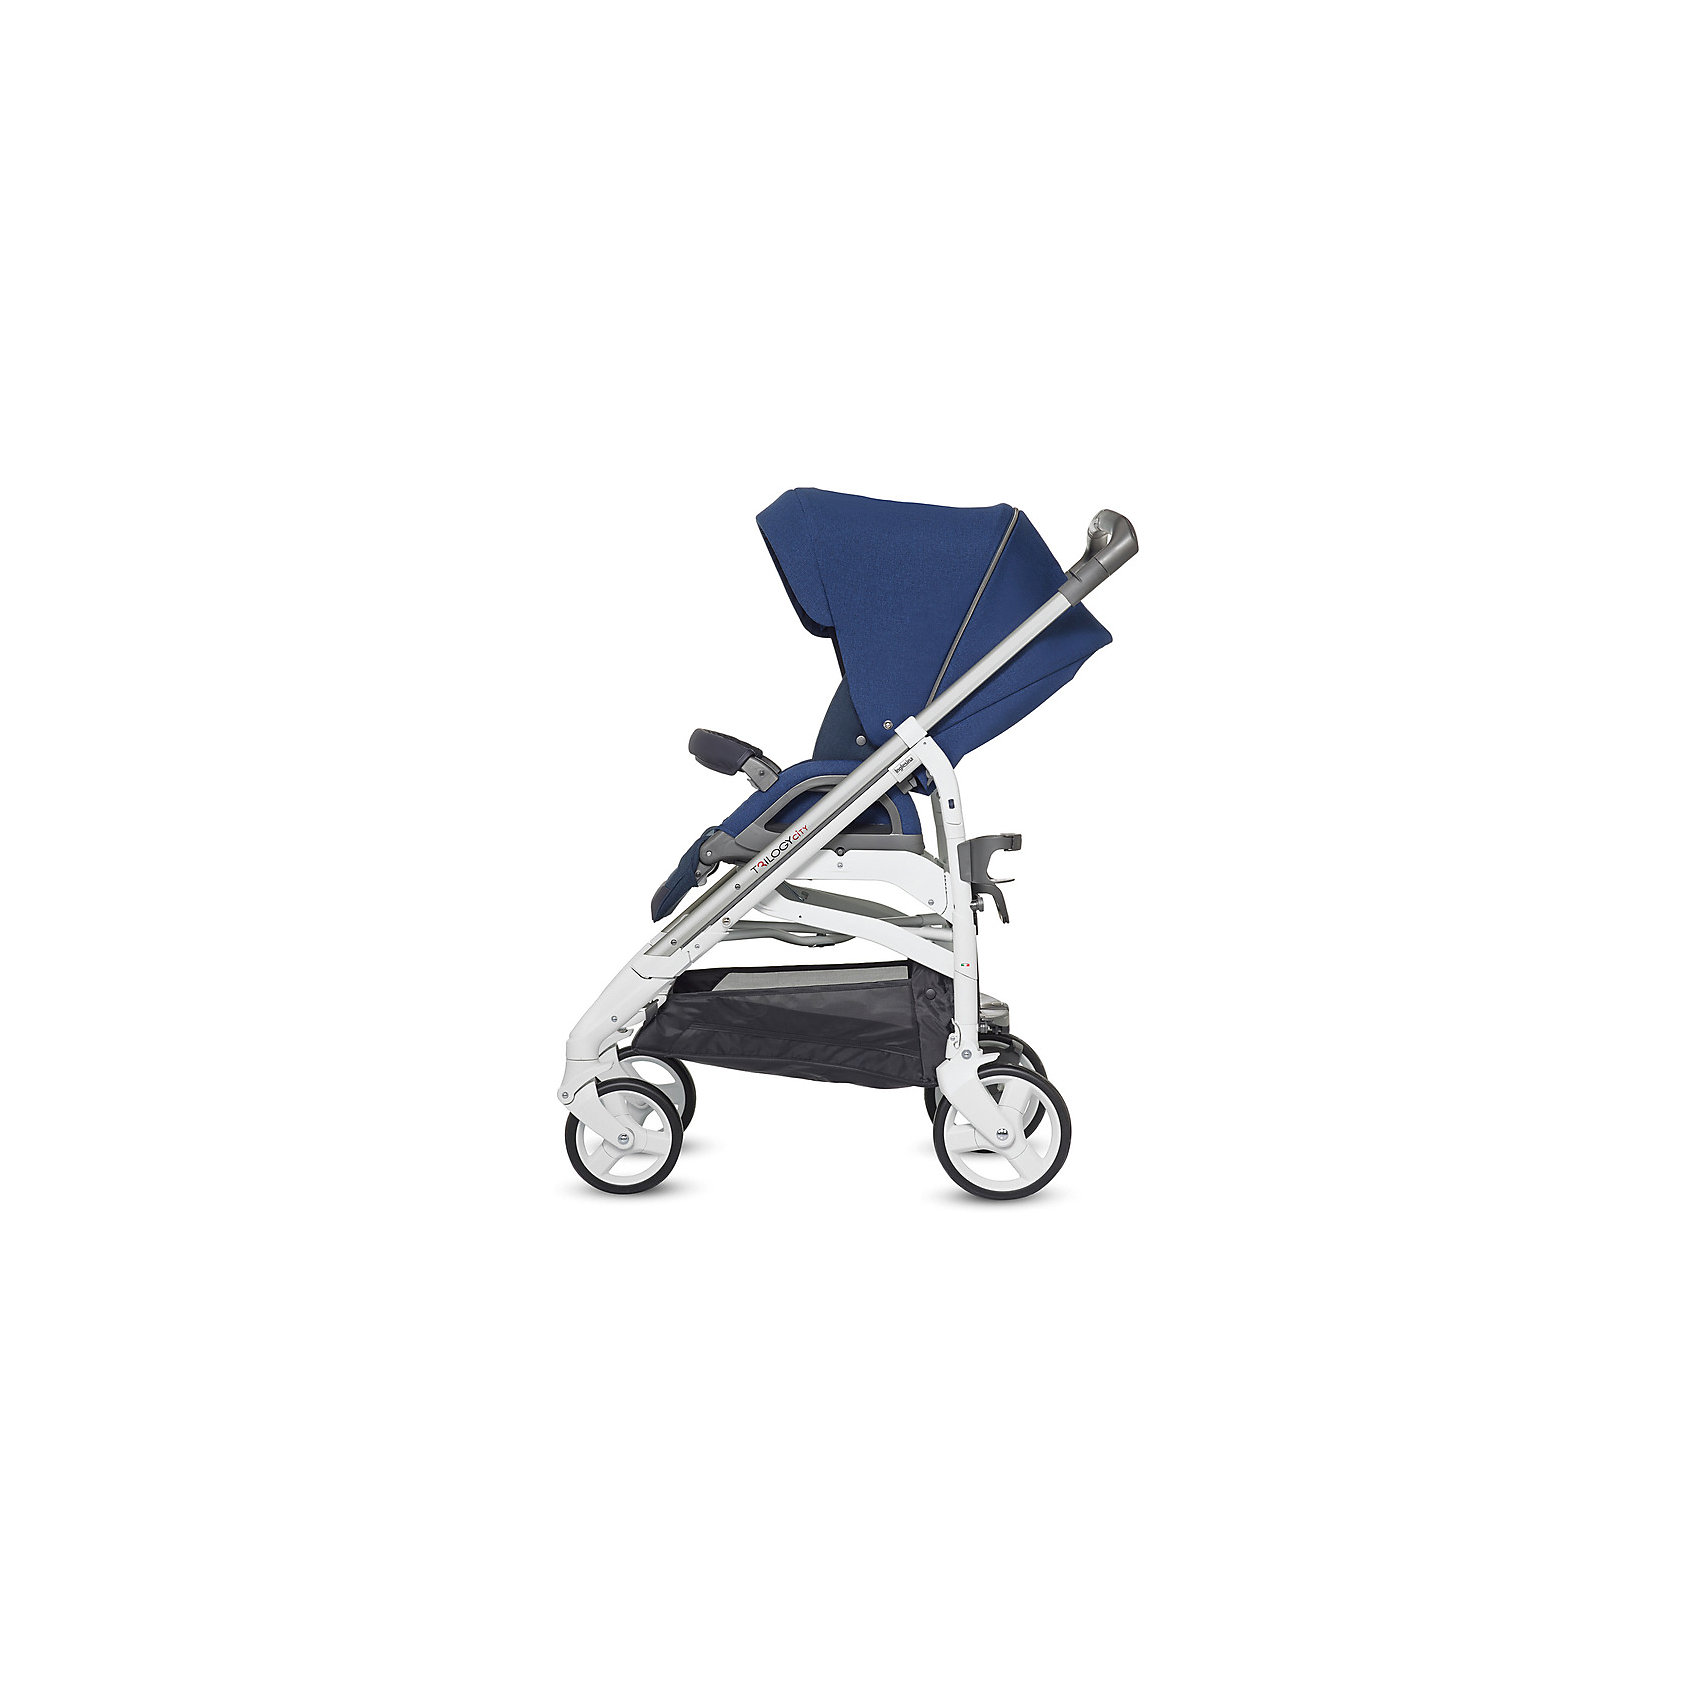 Прогулочная коляска Inglesina Trilogy all over, Cobalt Blue, белое шасси